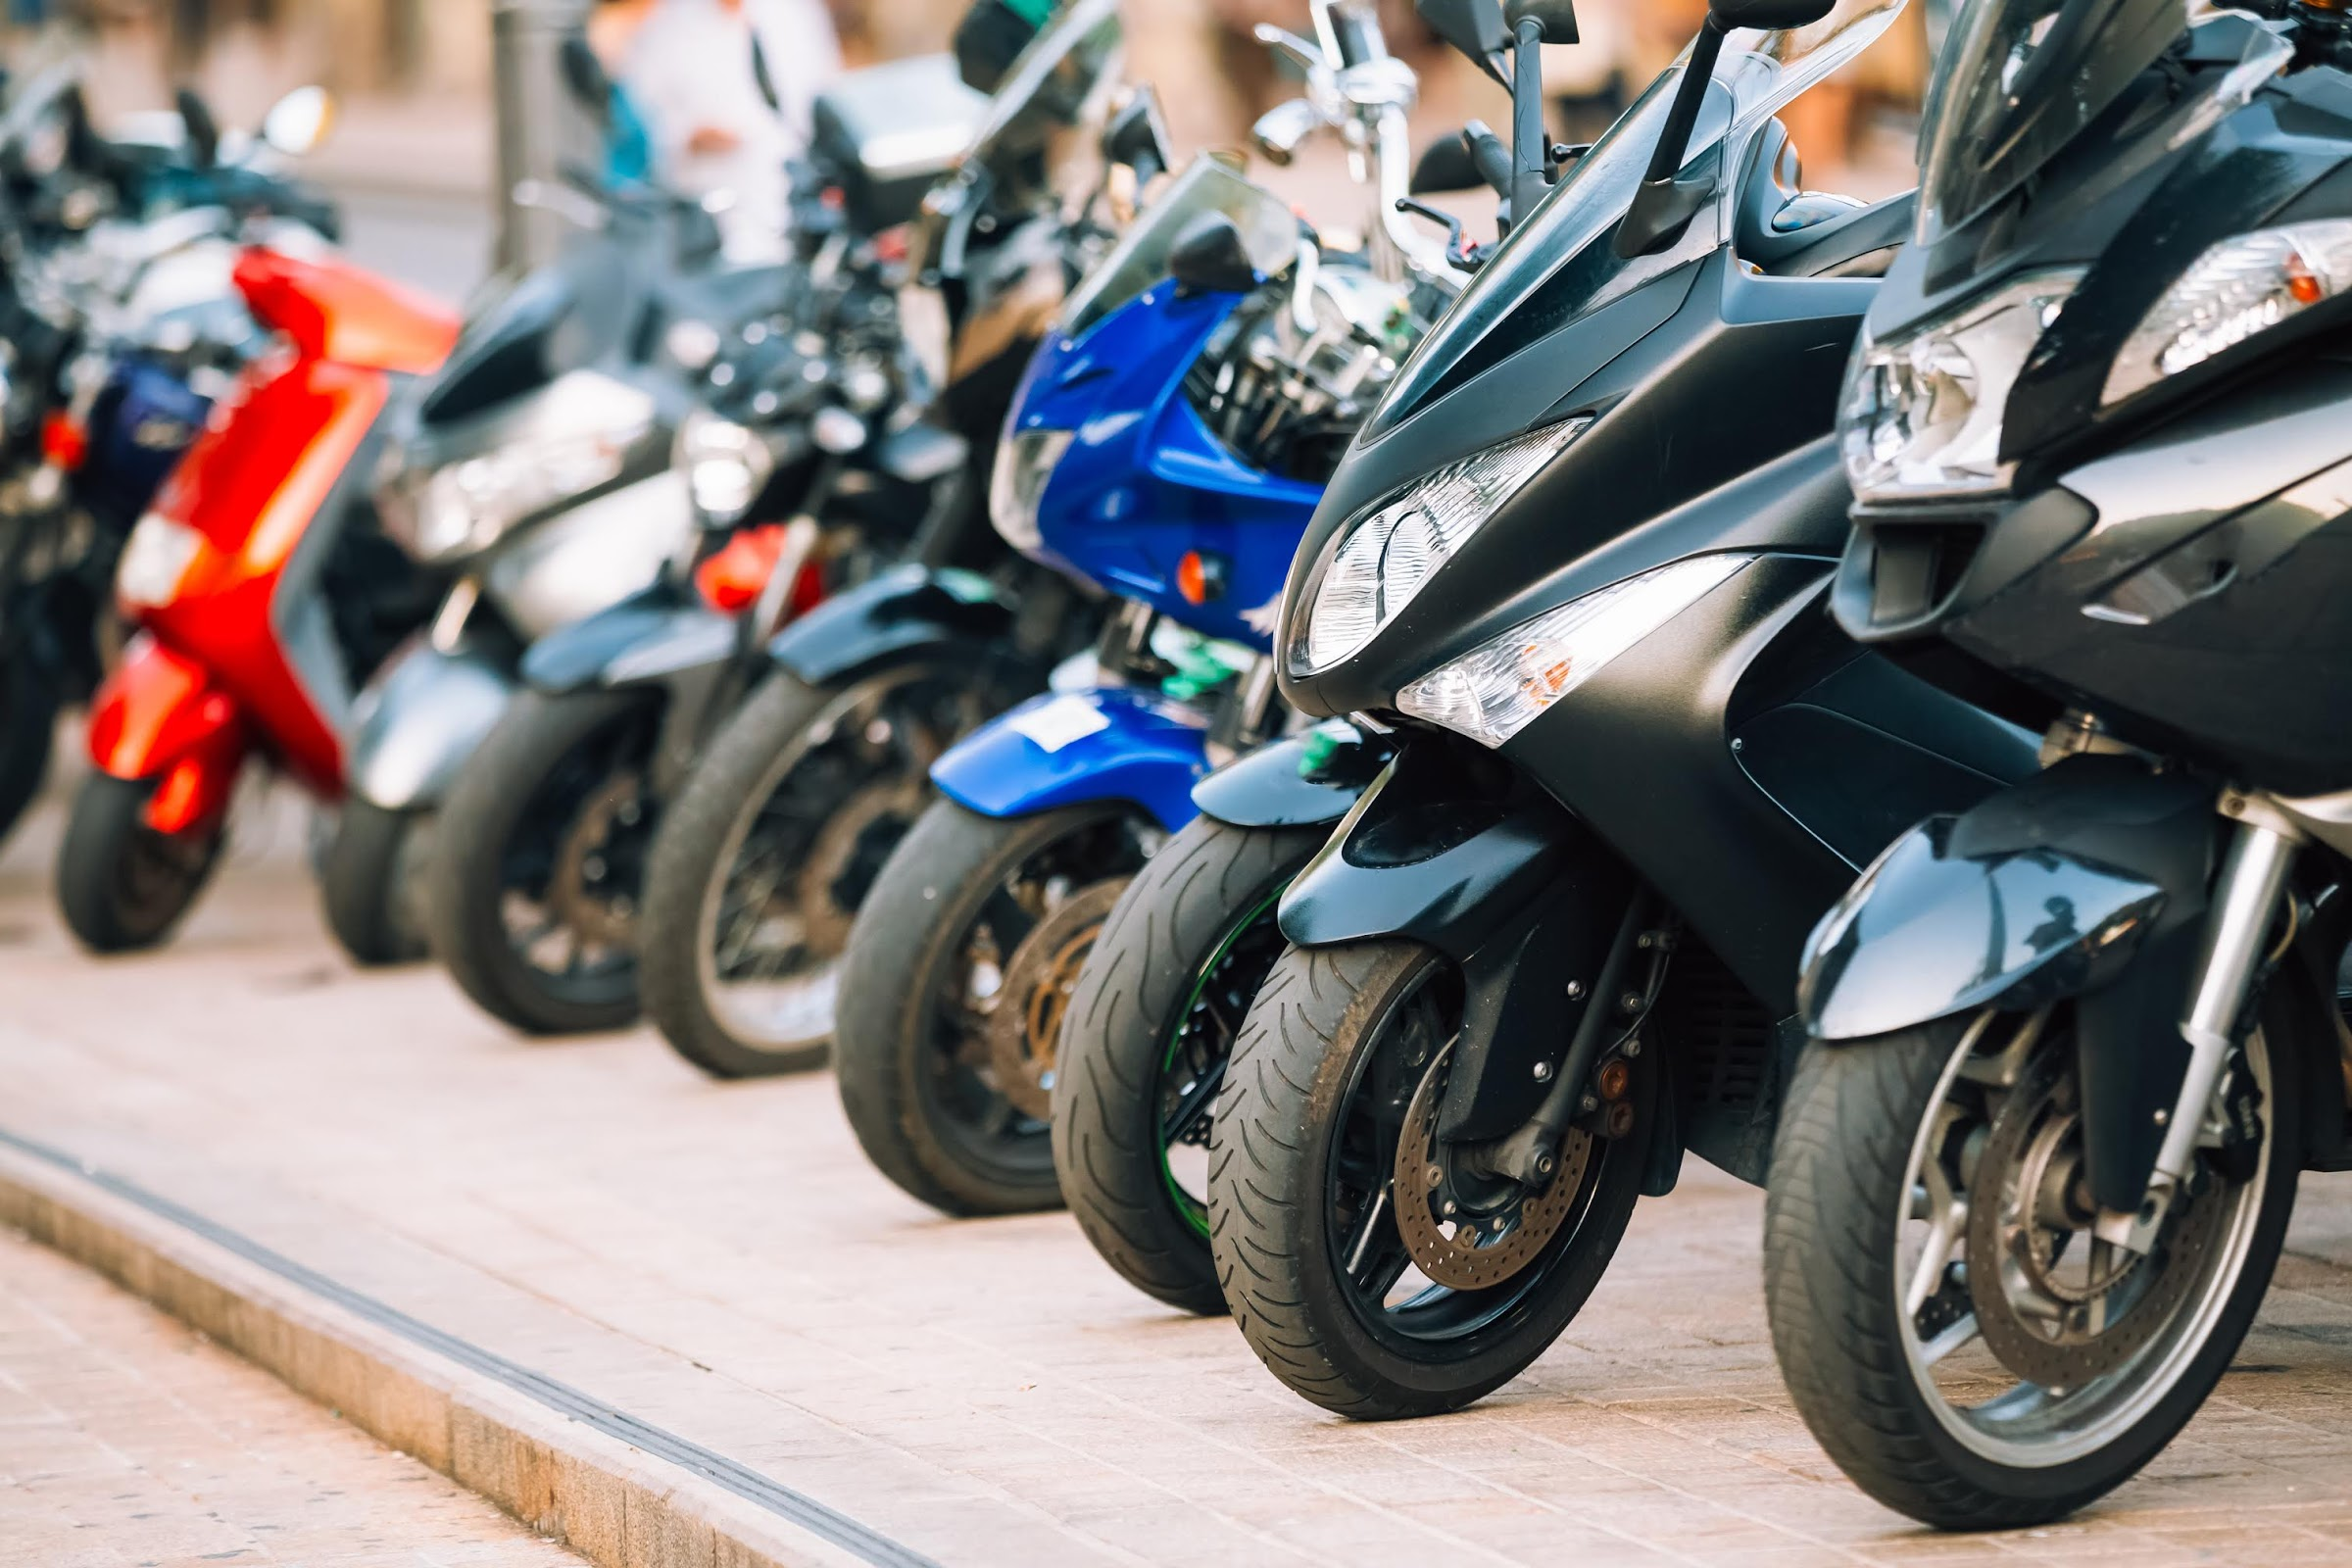 Informe de matrículas de motocicletas a junio de 2021